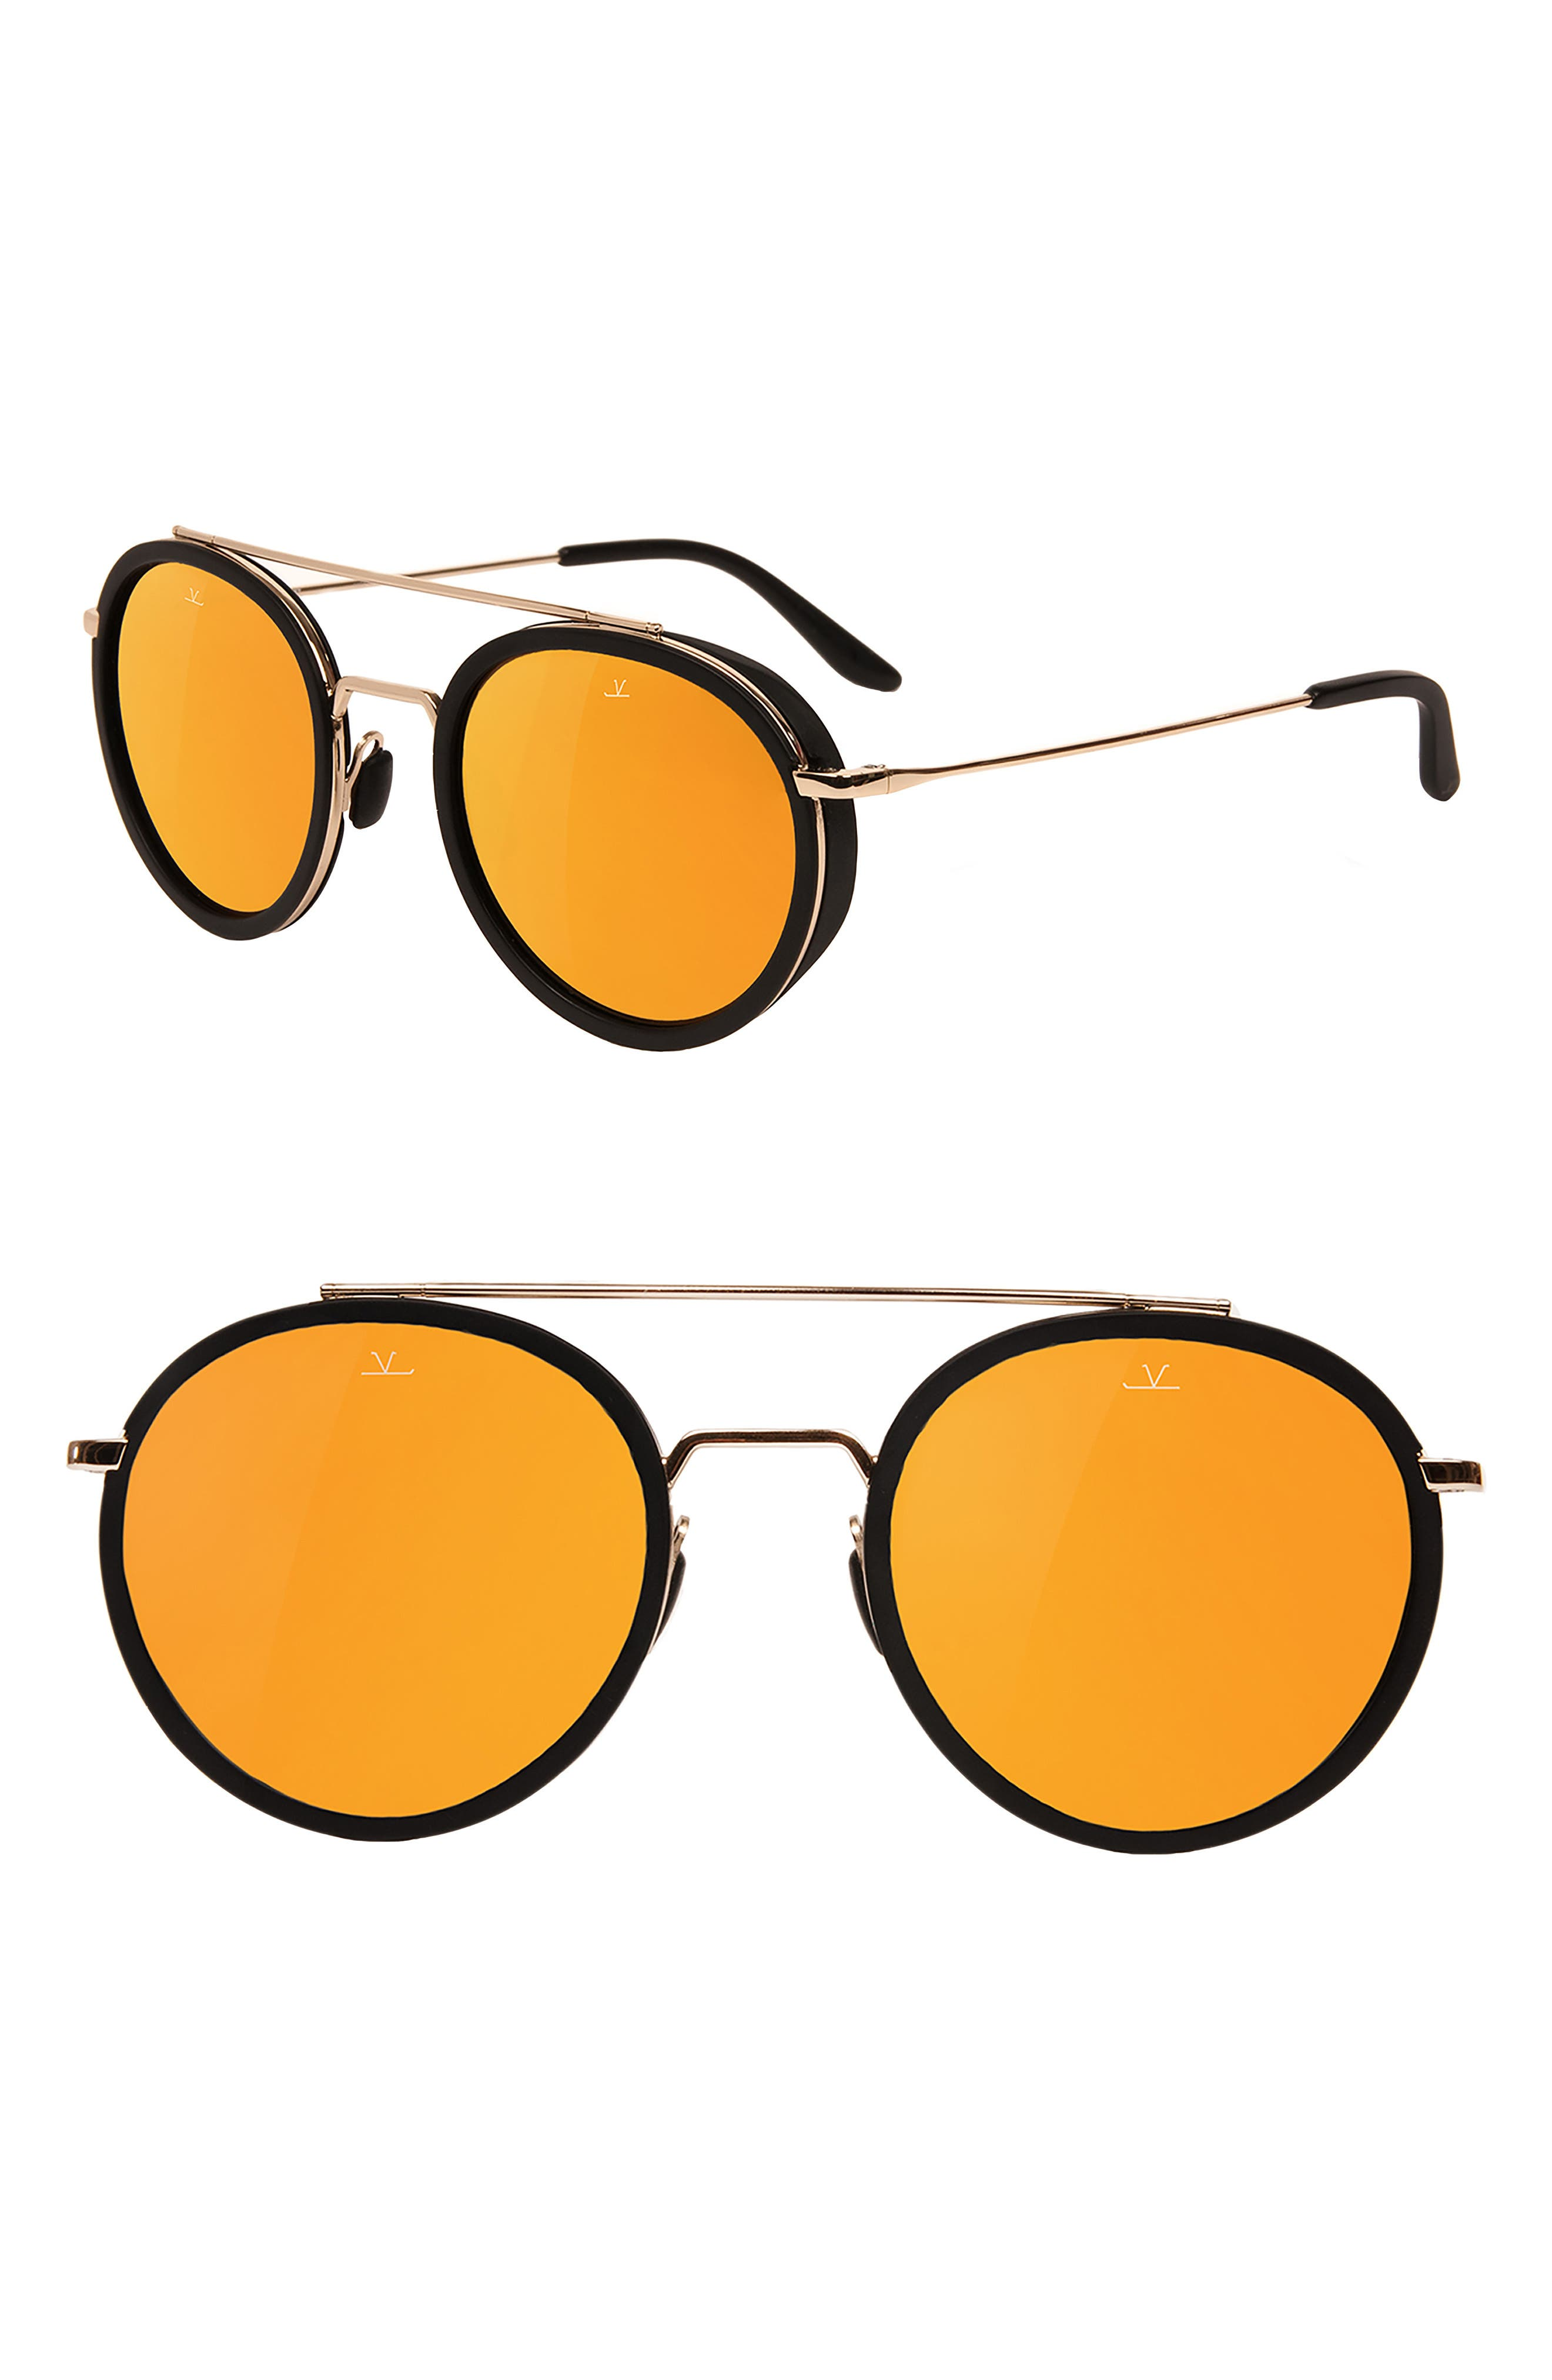 Edge 52mm Round Sunglasses,                             Main thumbnail 1, color,                             PURE BROWN GOLD FLASH